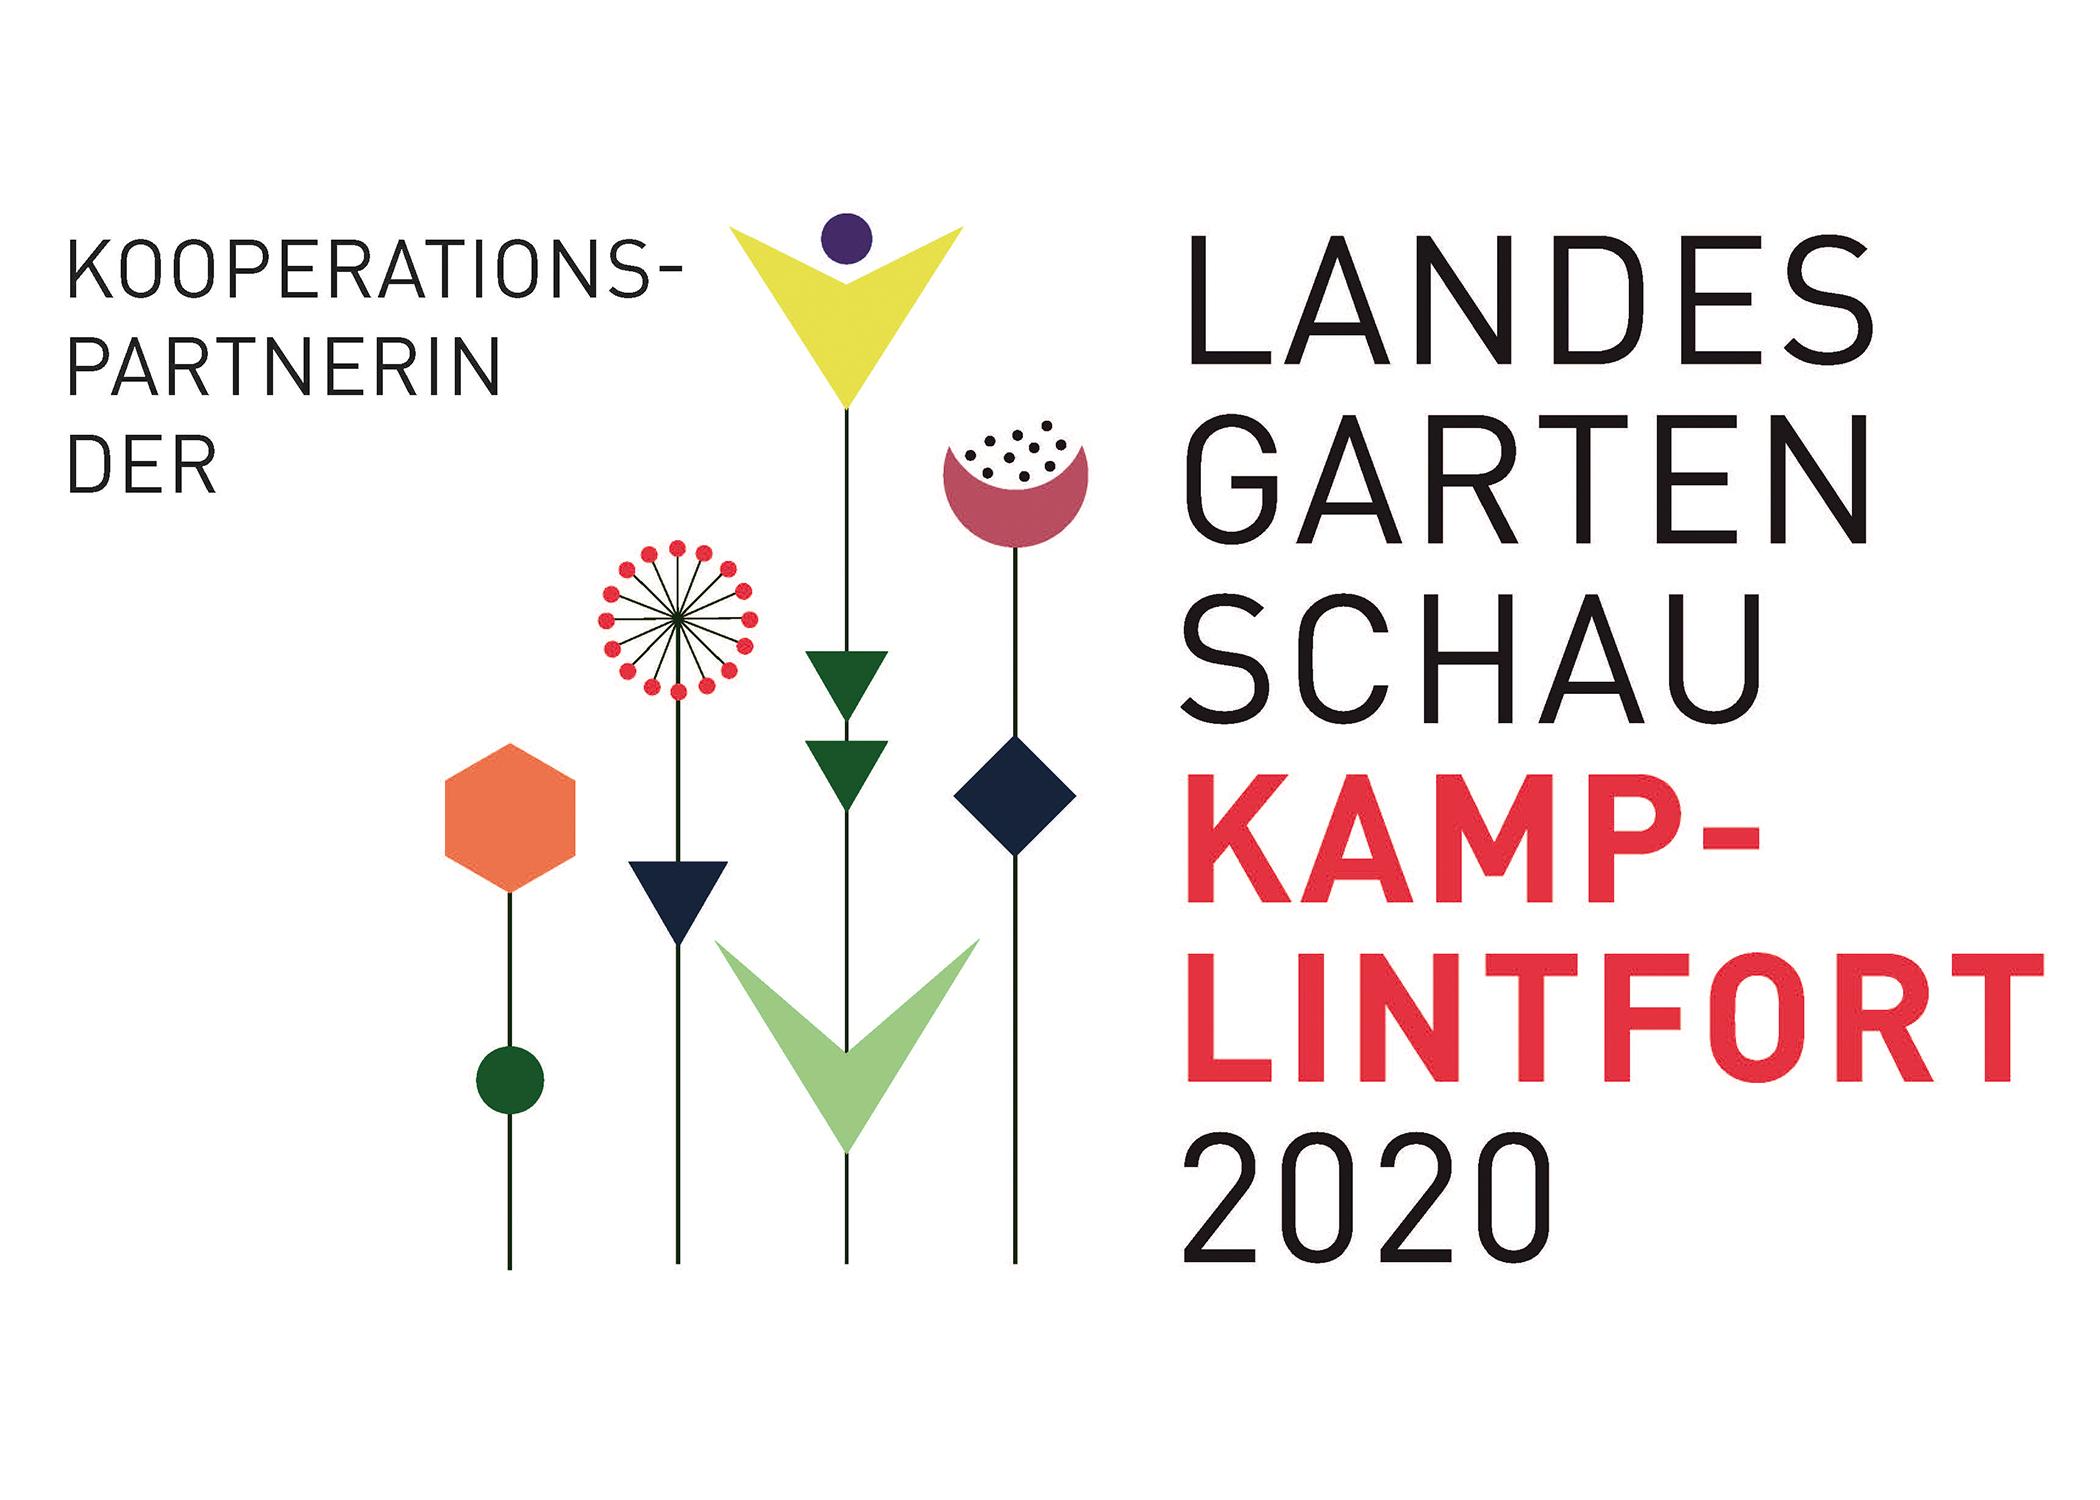 Landesgartenschau Kamp-Lintfort